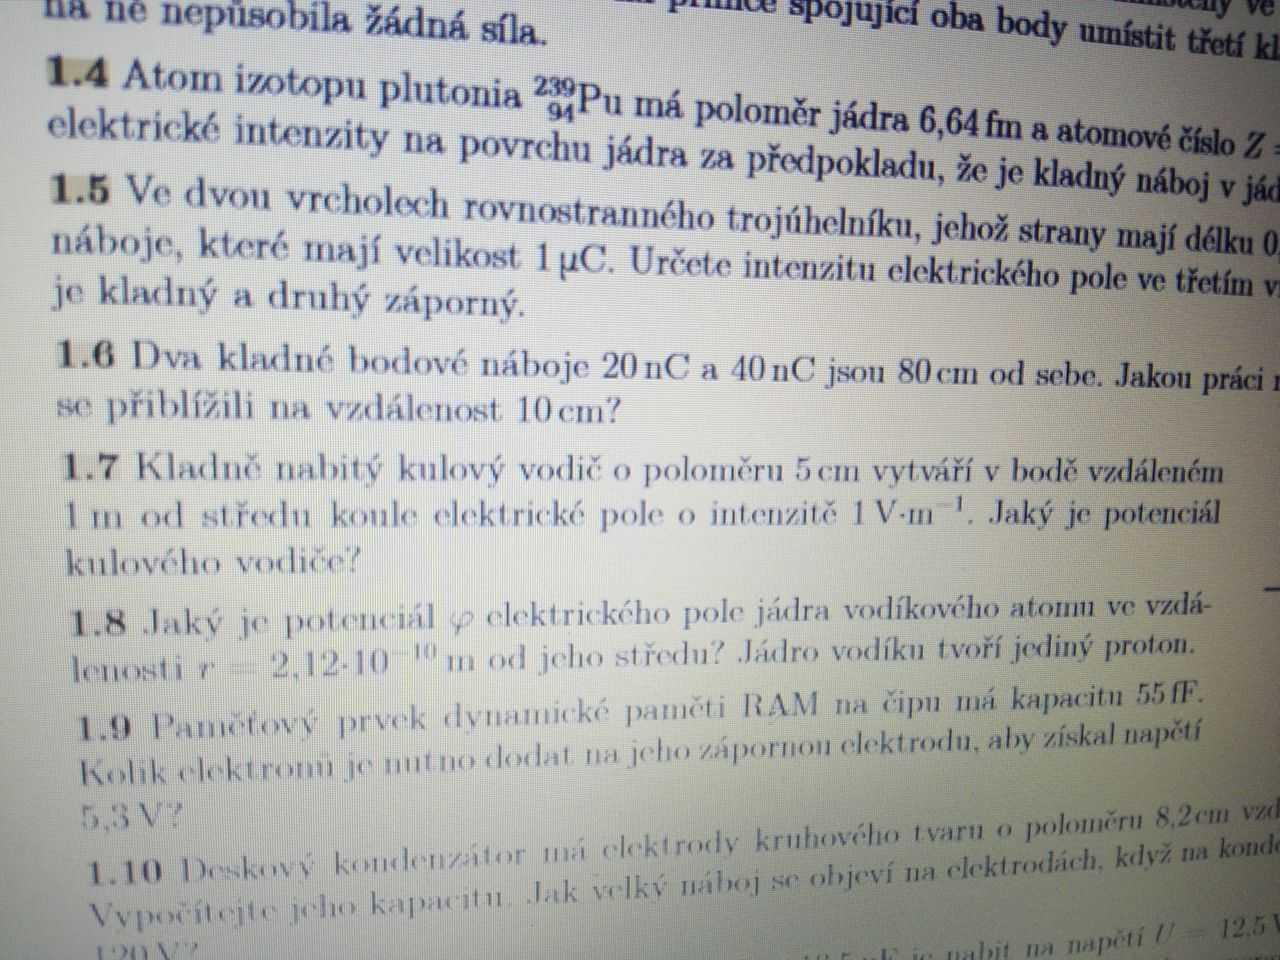 http://forum.matematika.cz/upload3/img/2018-02/50779_28309668_1688686341178406_1153265009_o.jpg